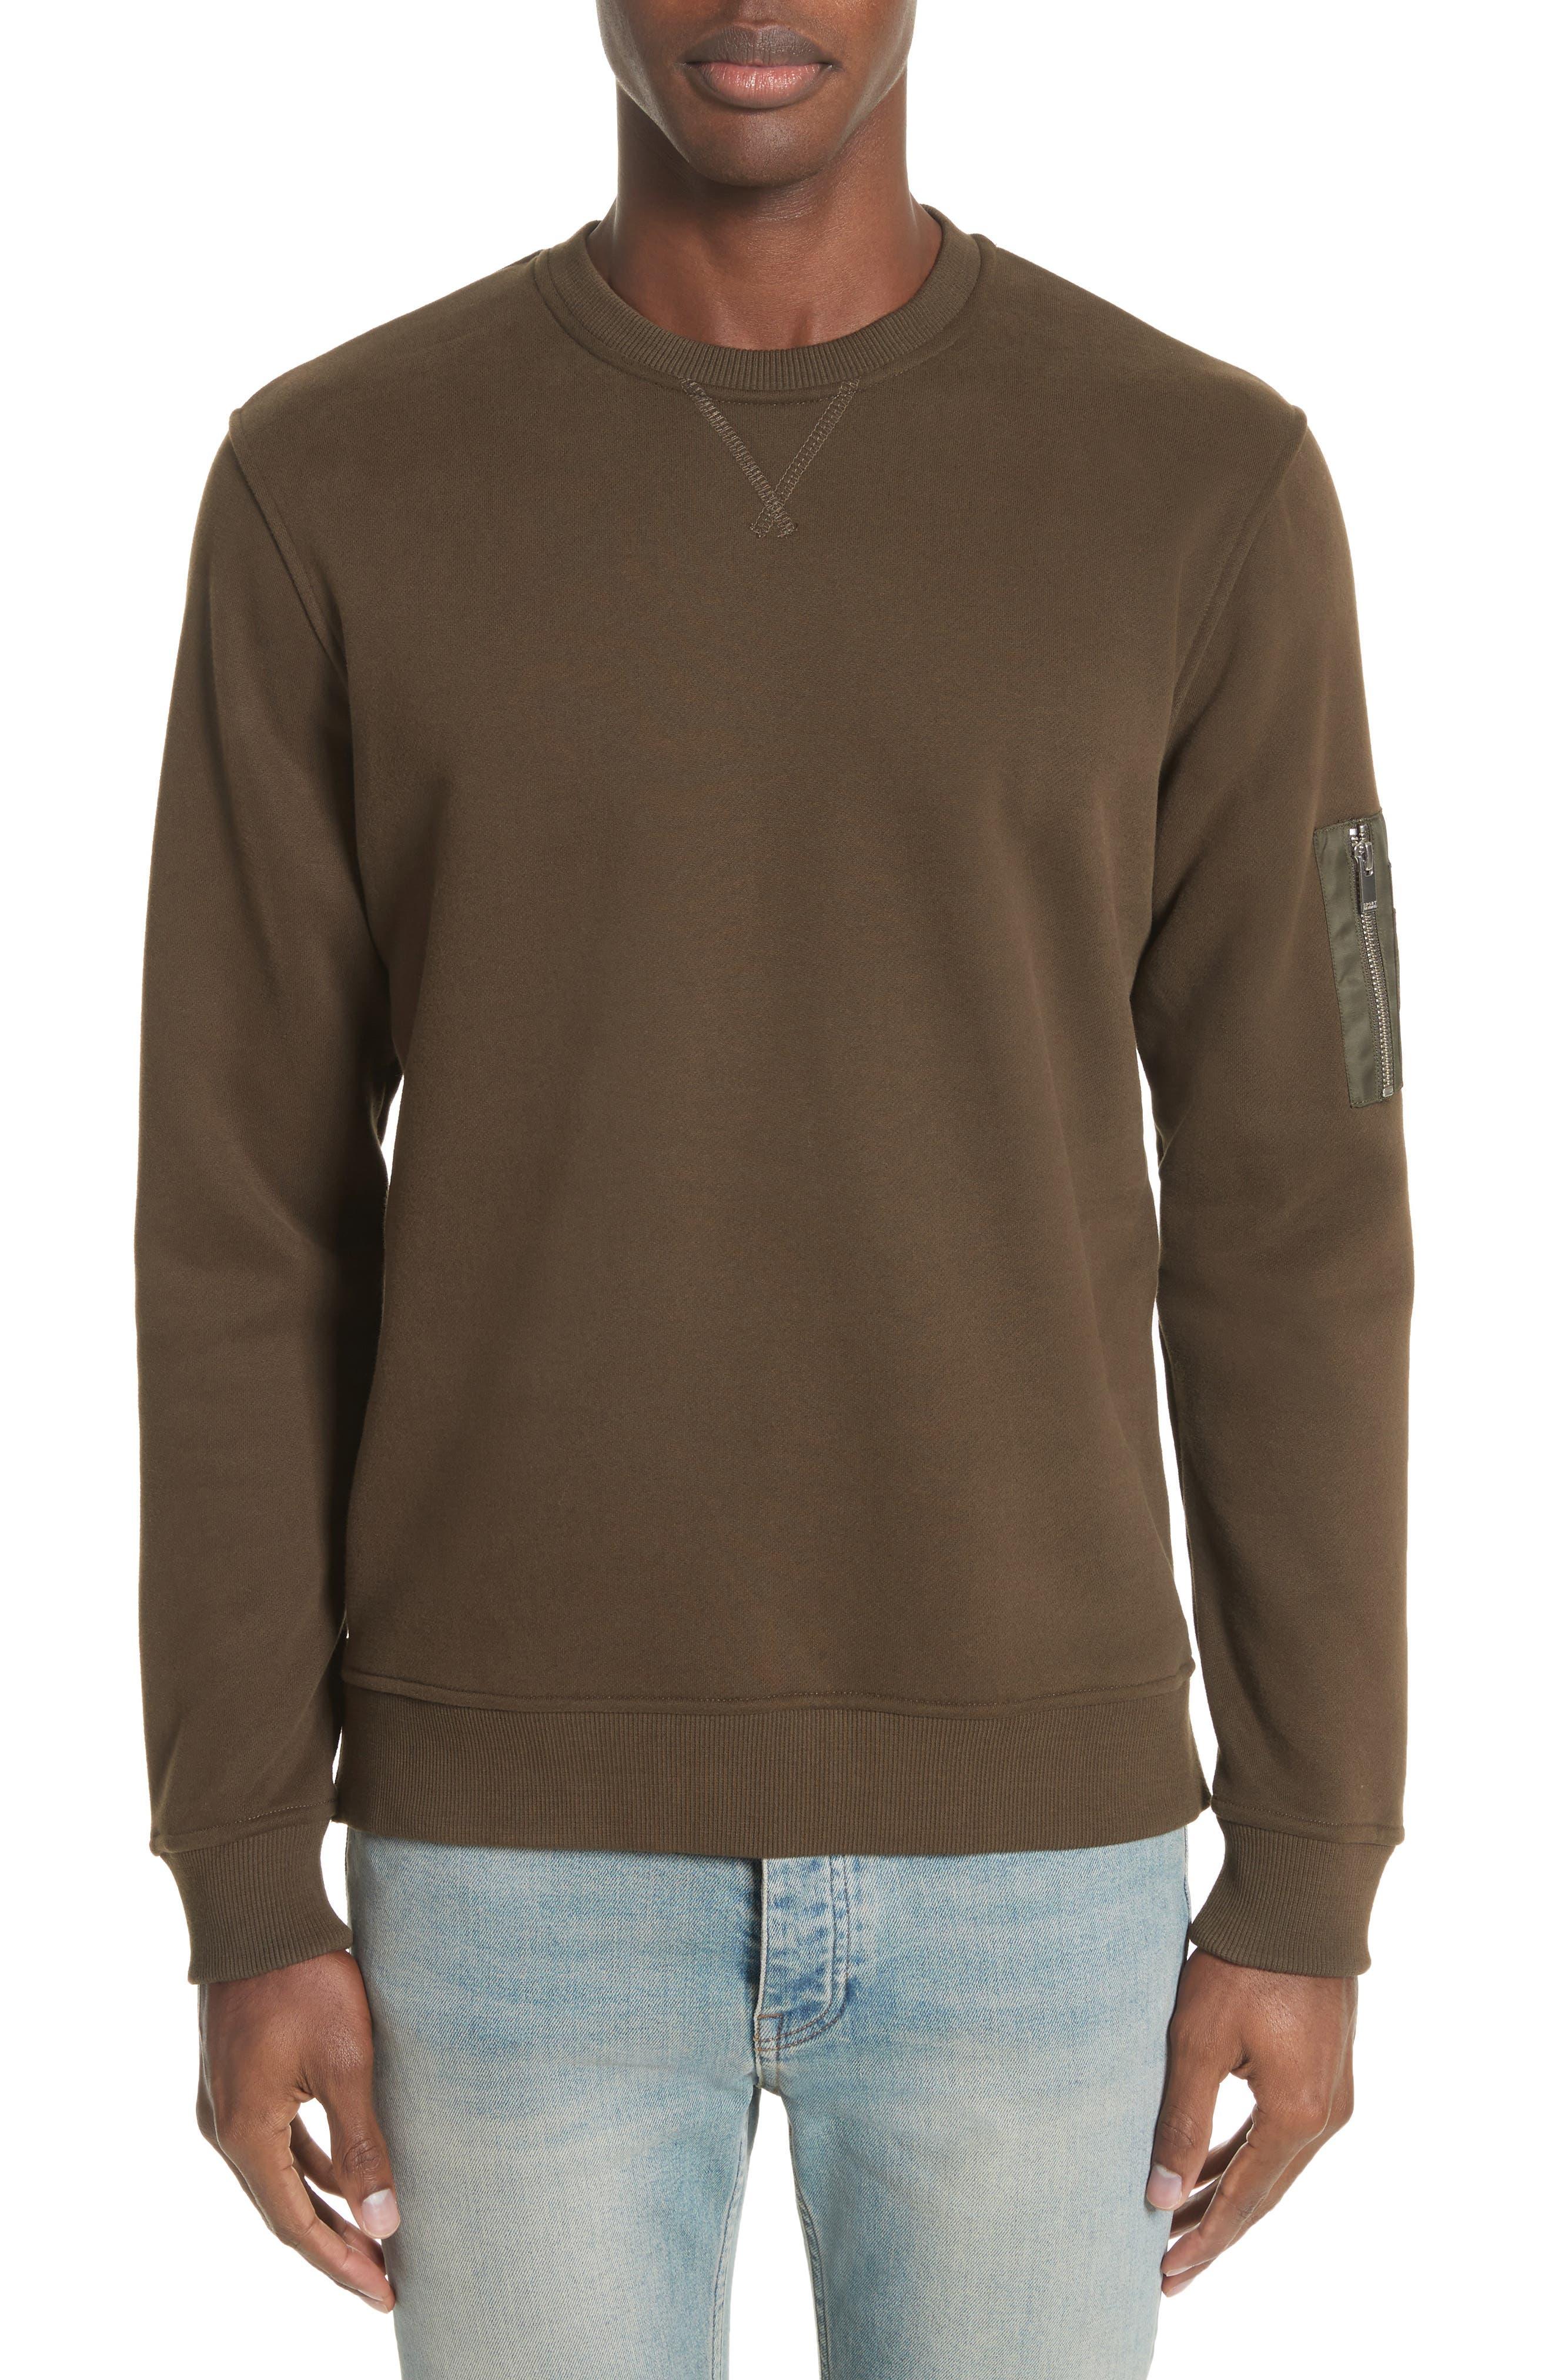 The Kooples Crewneck Cotton Sweater